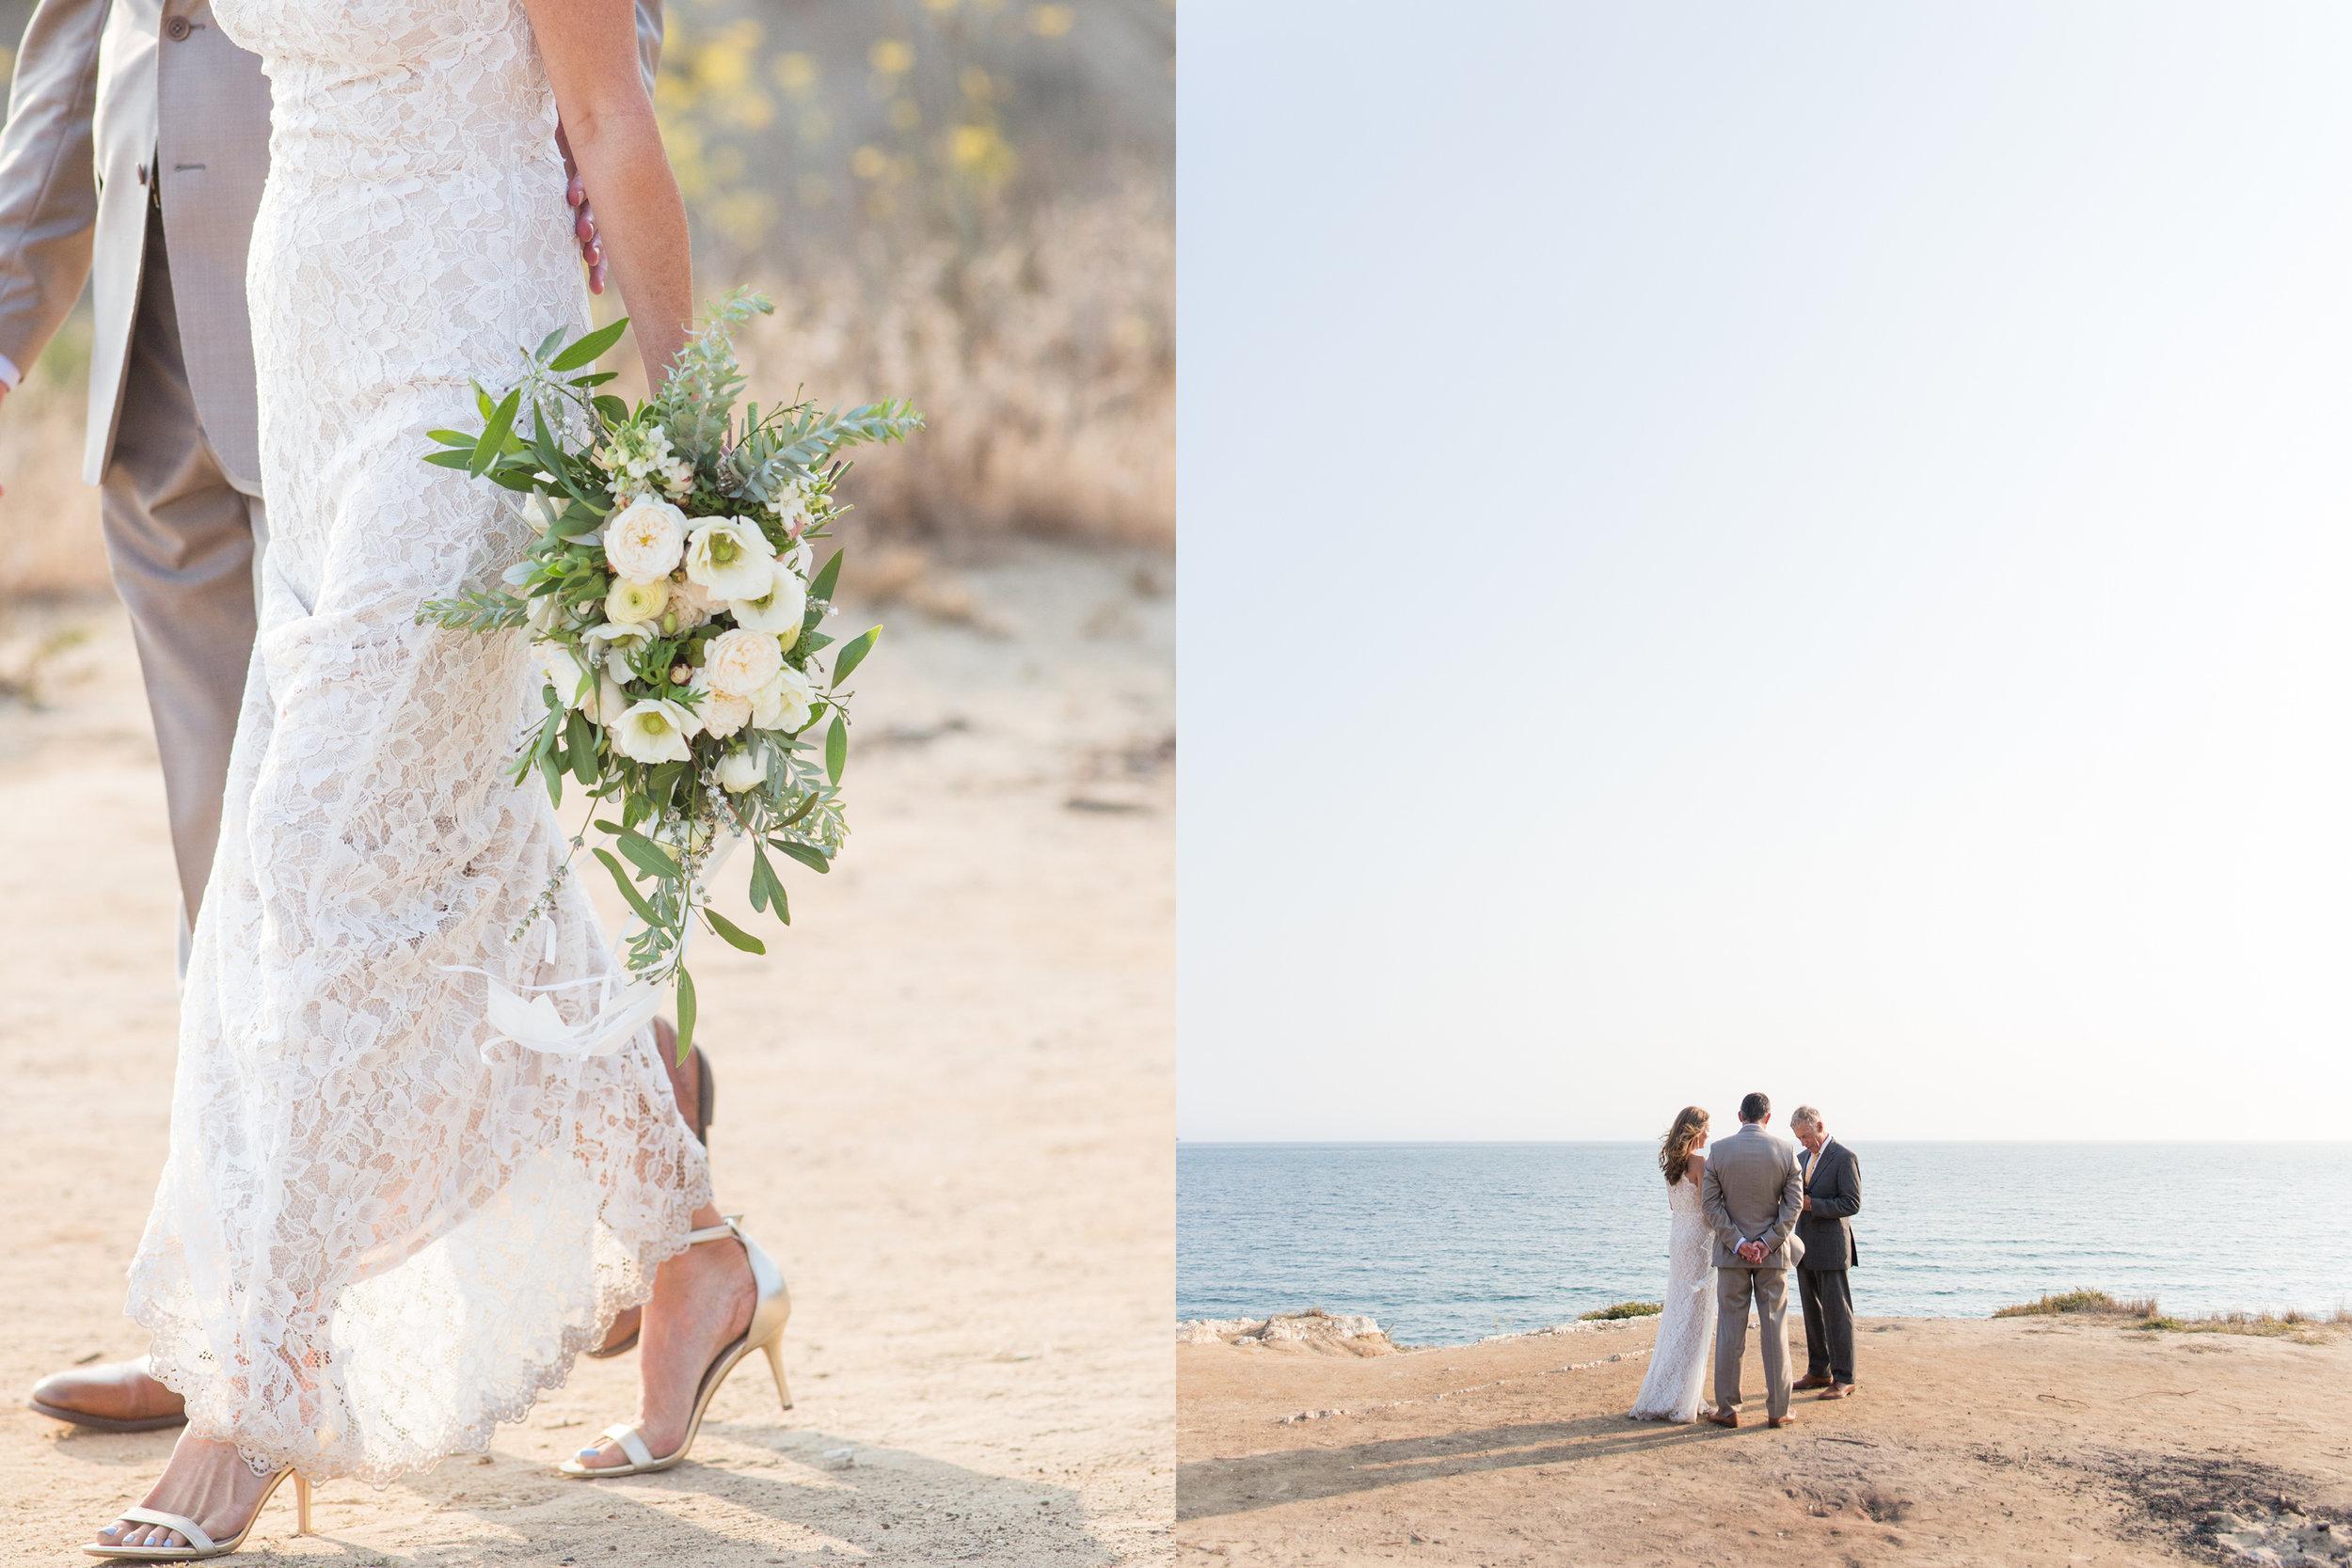 santa-barbara-elopement-elope-wedding-planner-coordinator-coordination-day-of-intimate-rustic-ellwood-bluffs-forest-beach-ocean-view-green-white-event (7).jpg